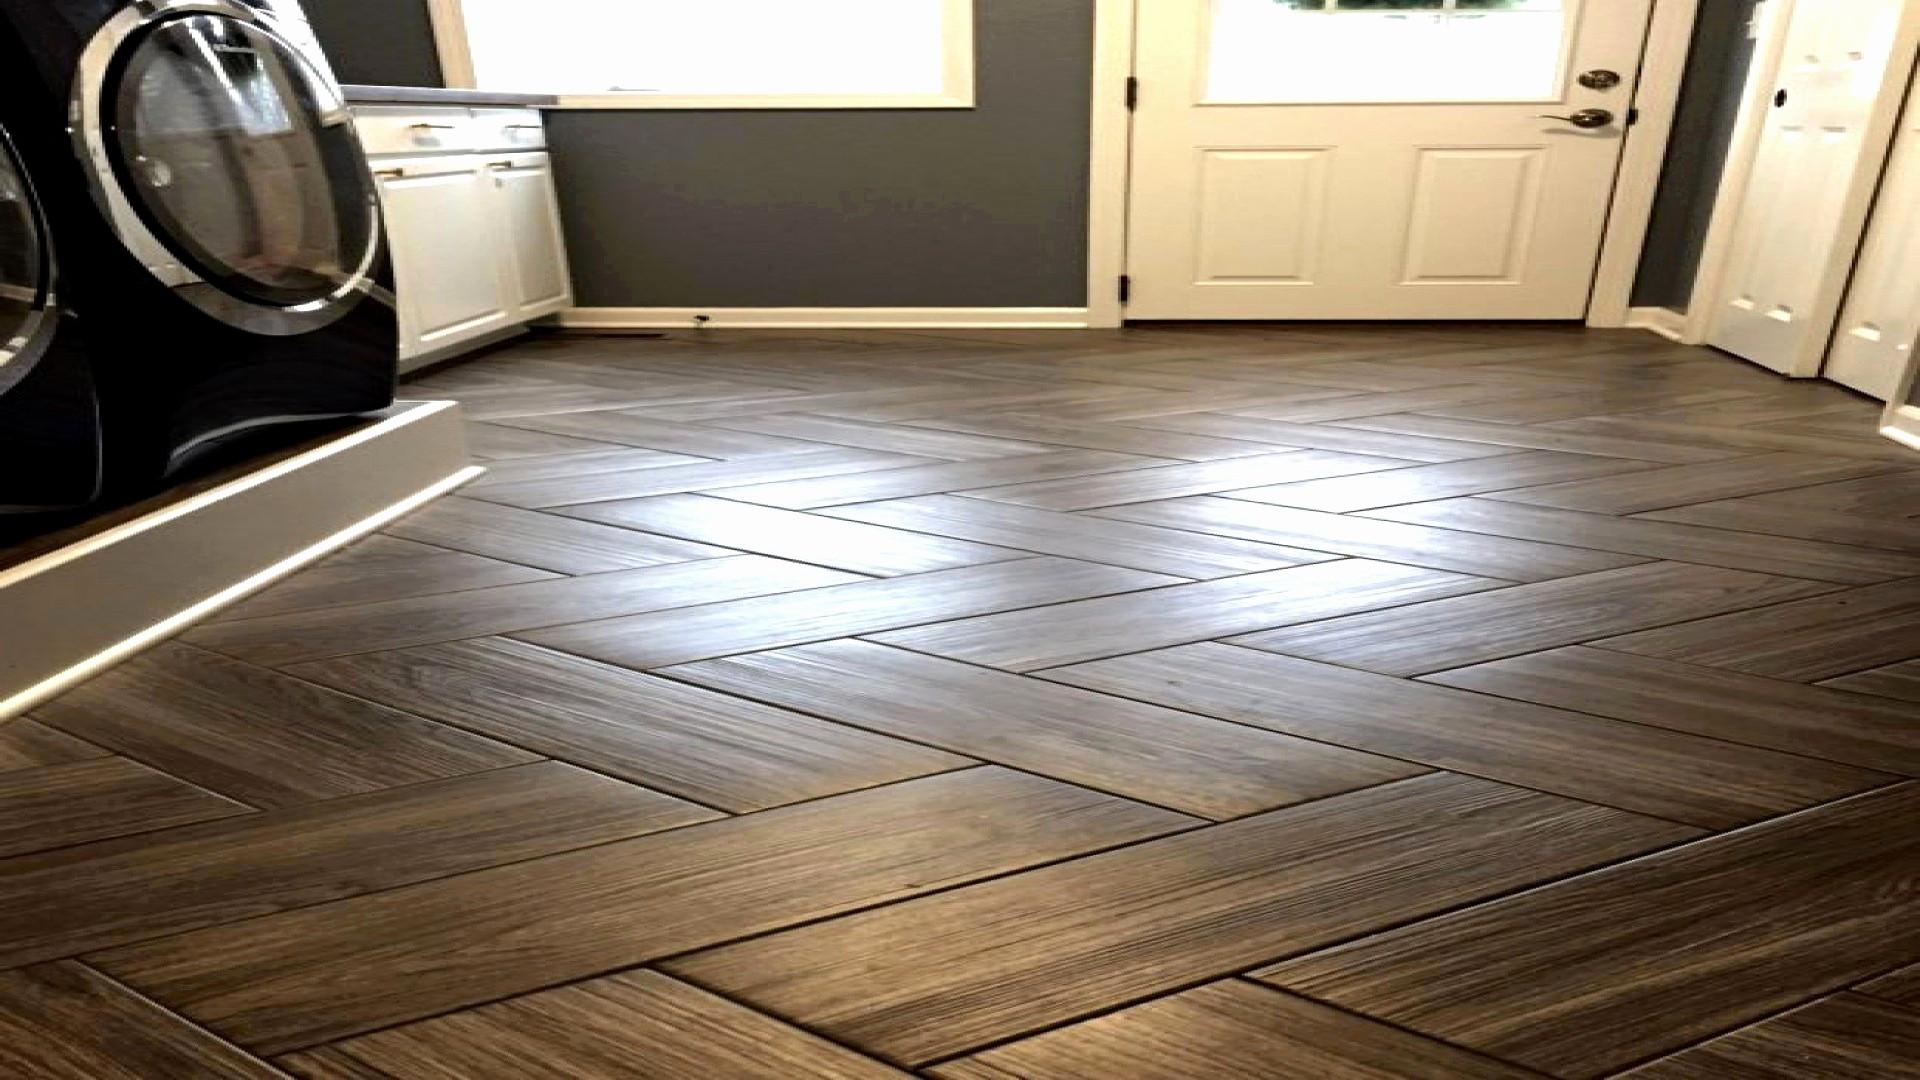 5 hand scraped hardwood flooring of 19 awesome hardwood flooring for sale photograph dizpos com with regard to hardwood flooring for sale best of 52 luxury wood flooring sale 52 s photograph